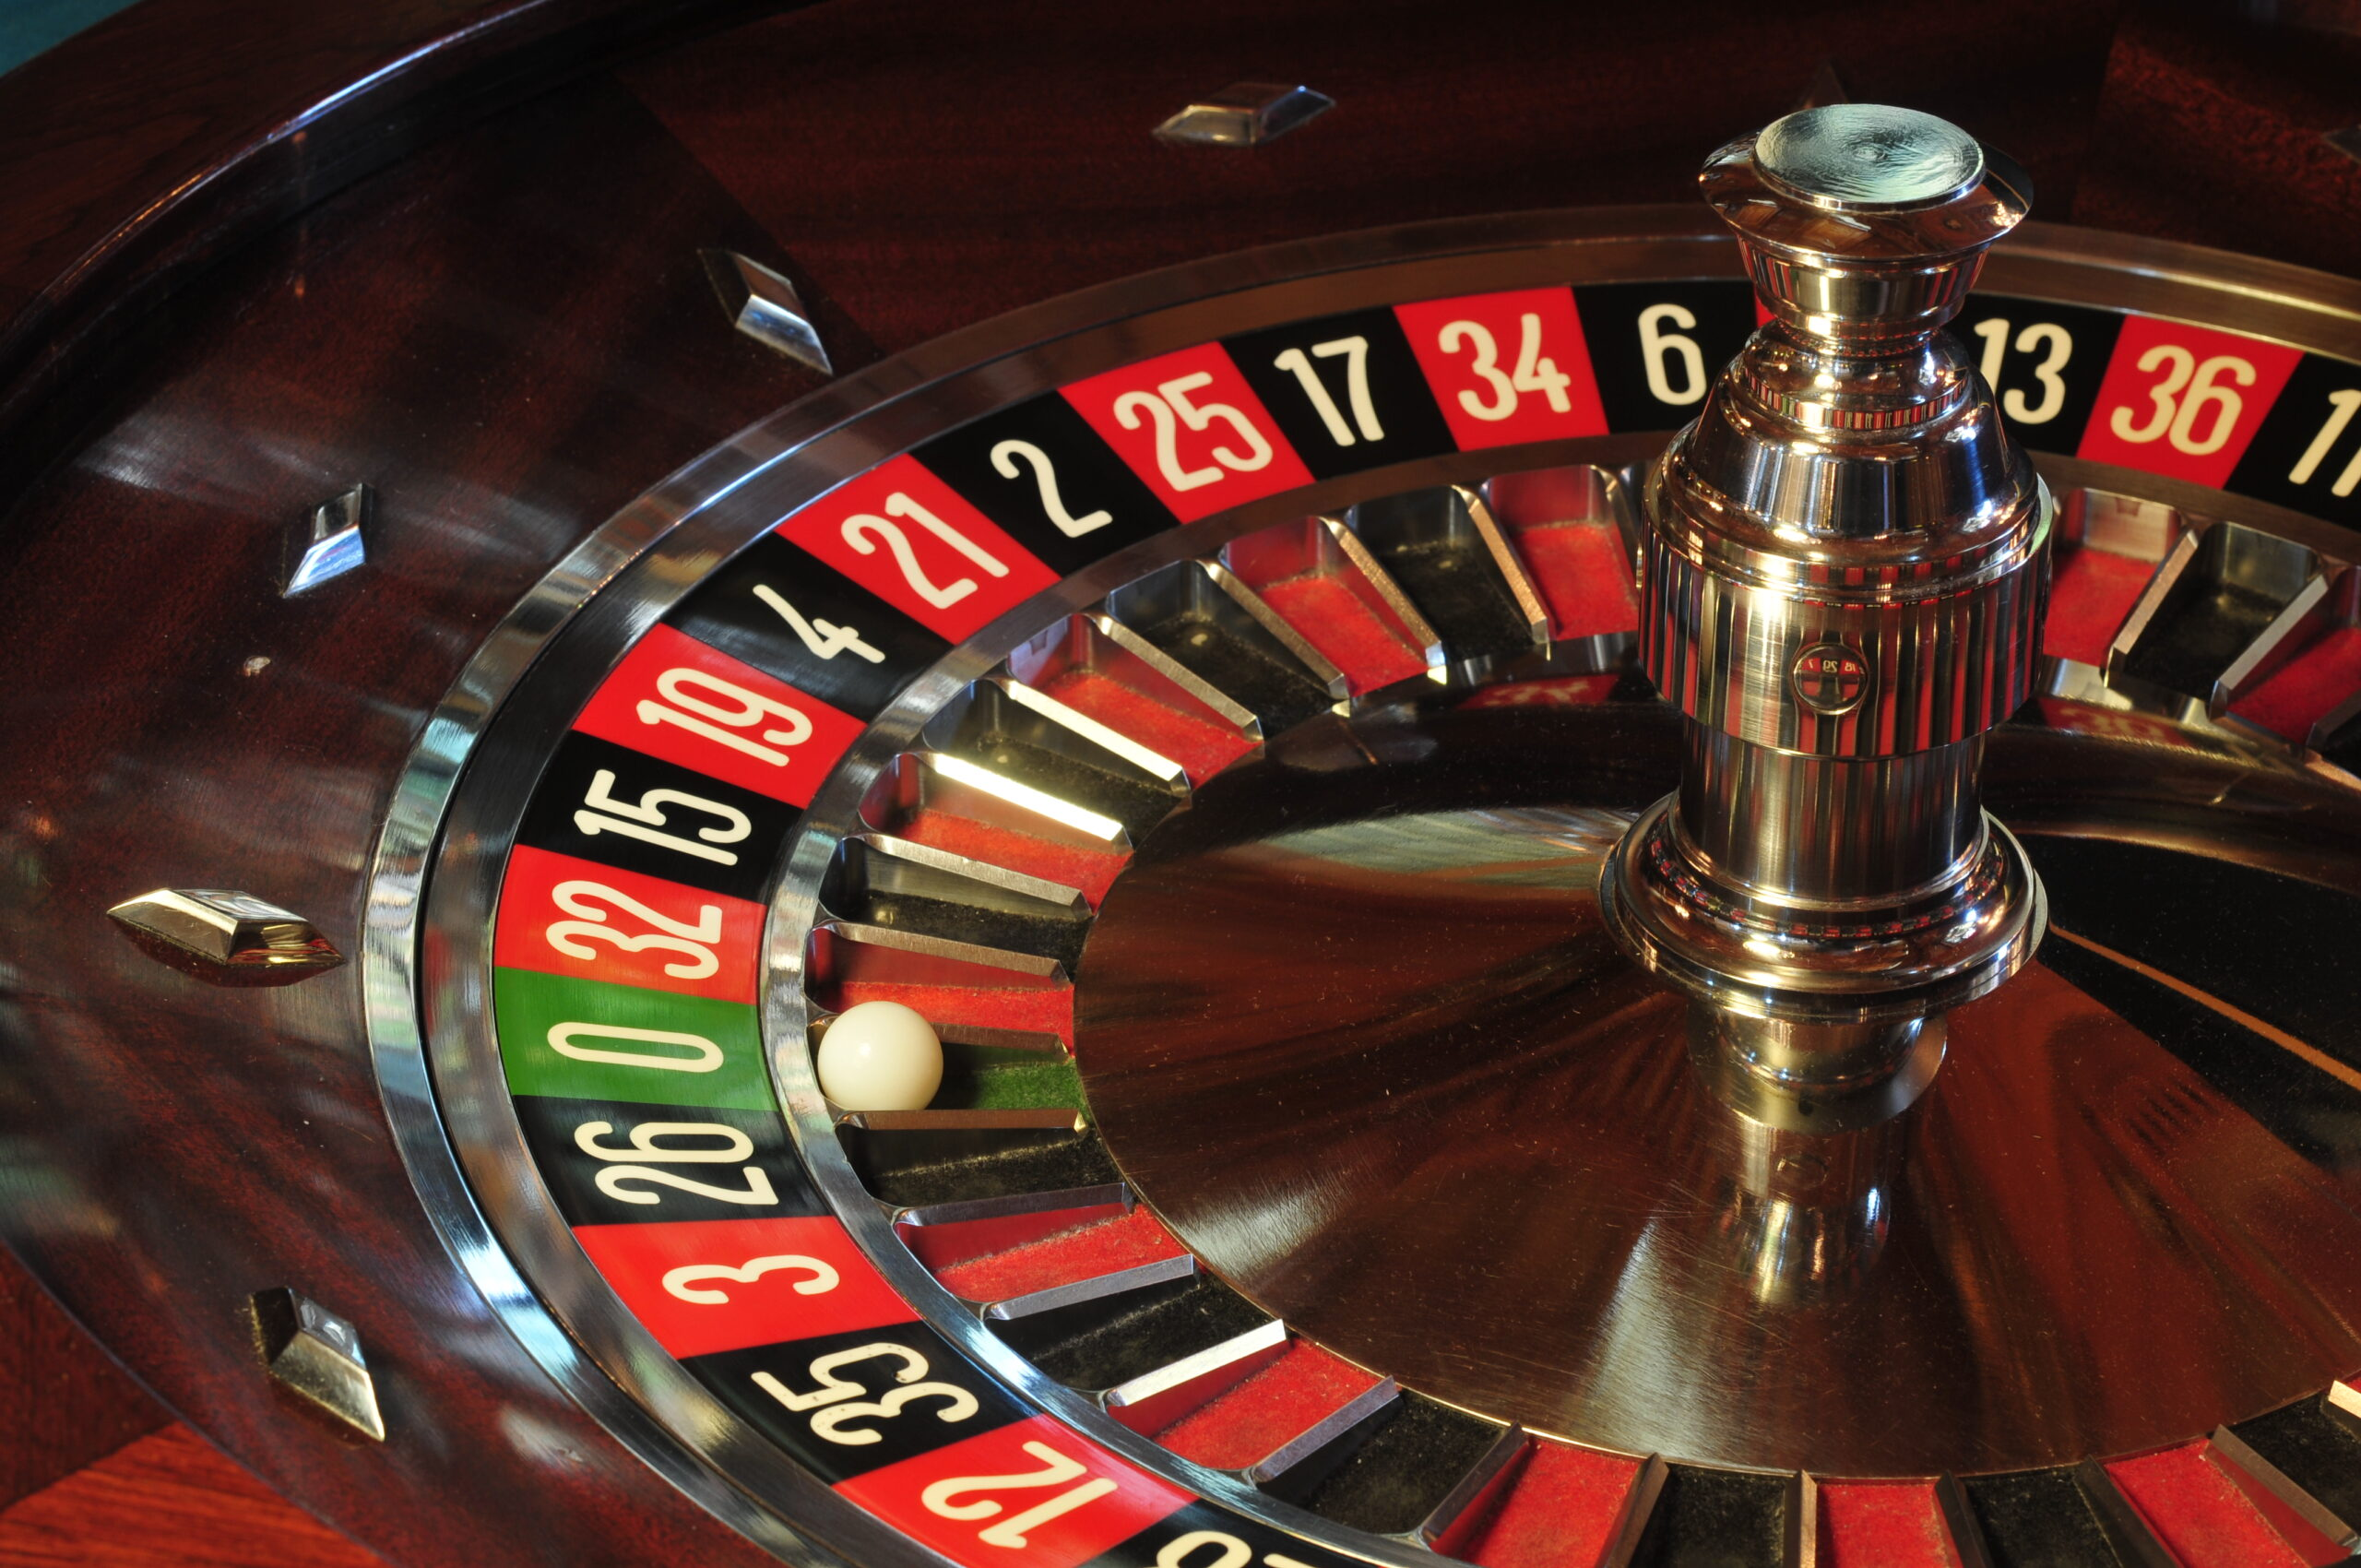 Roulette francese Royale gratis: dove giocare